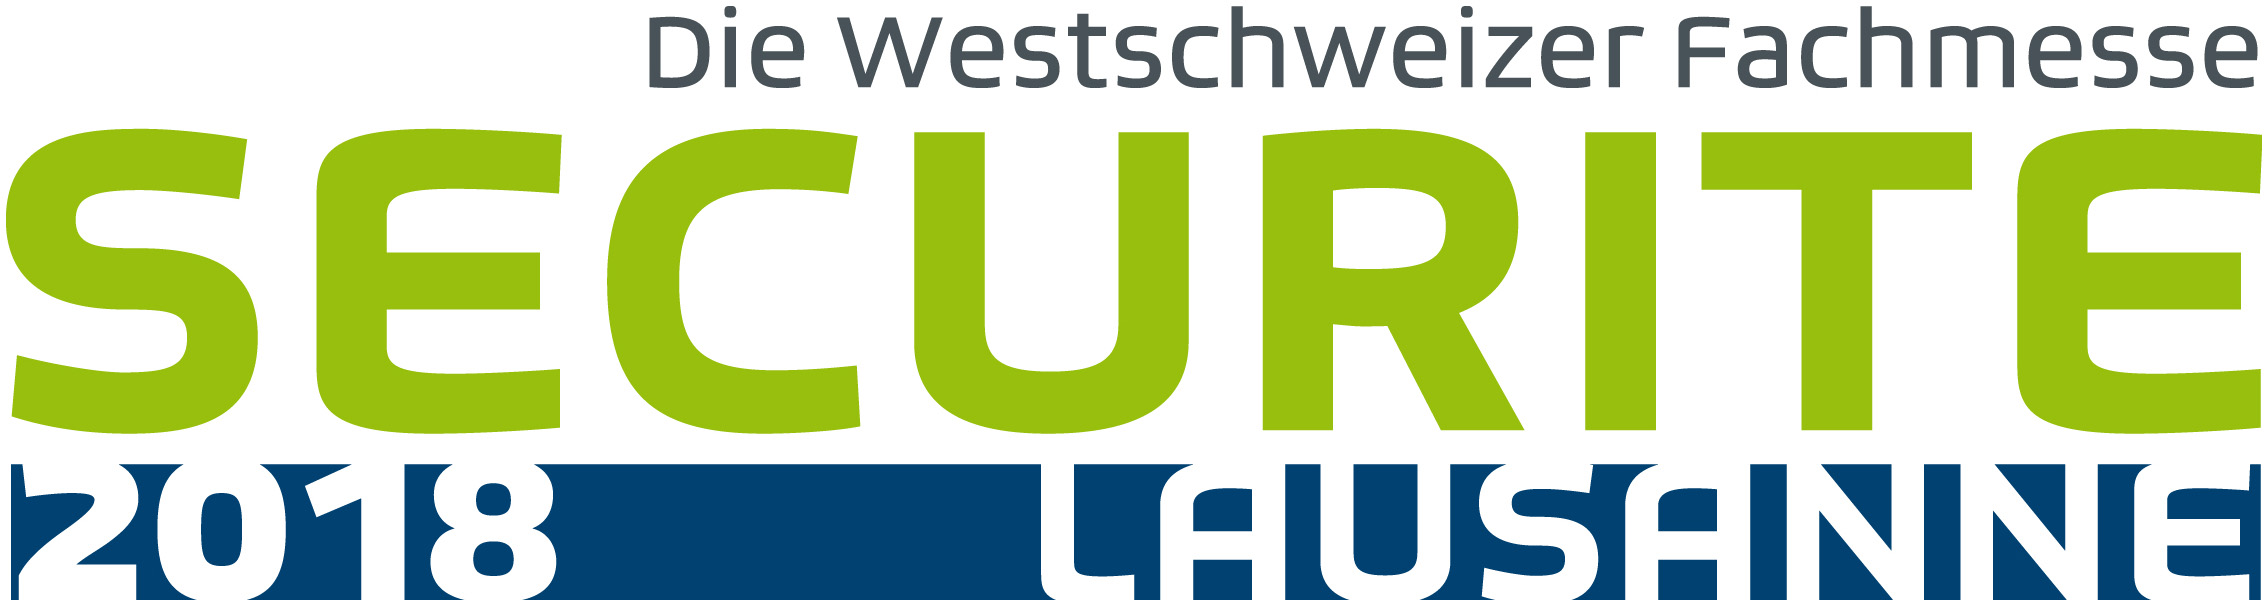 Logo - SICHERHEIT_2017_logo